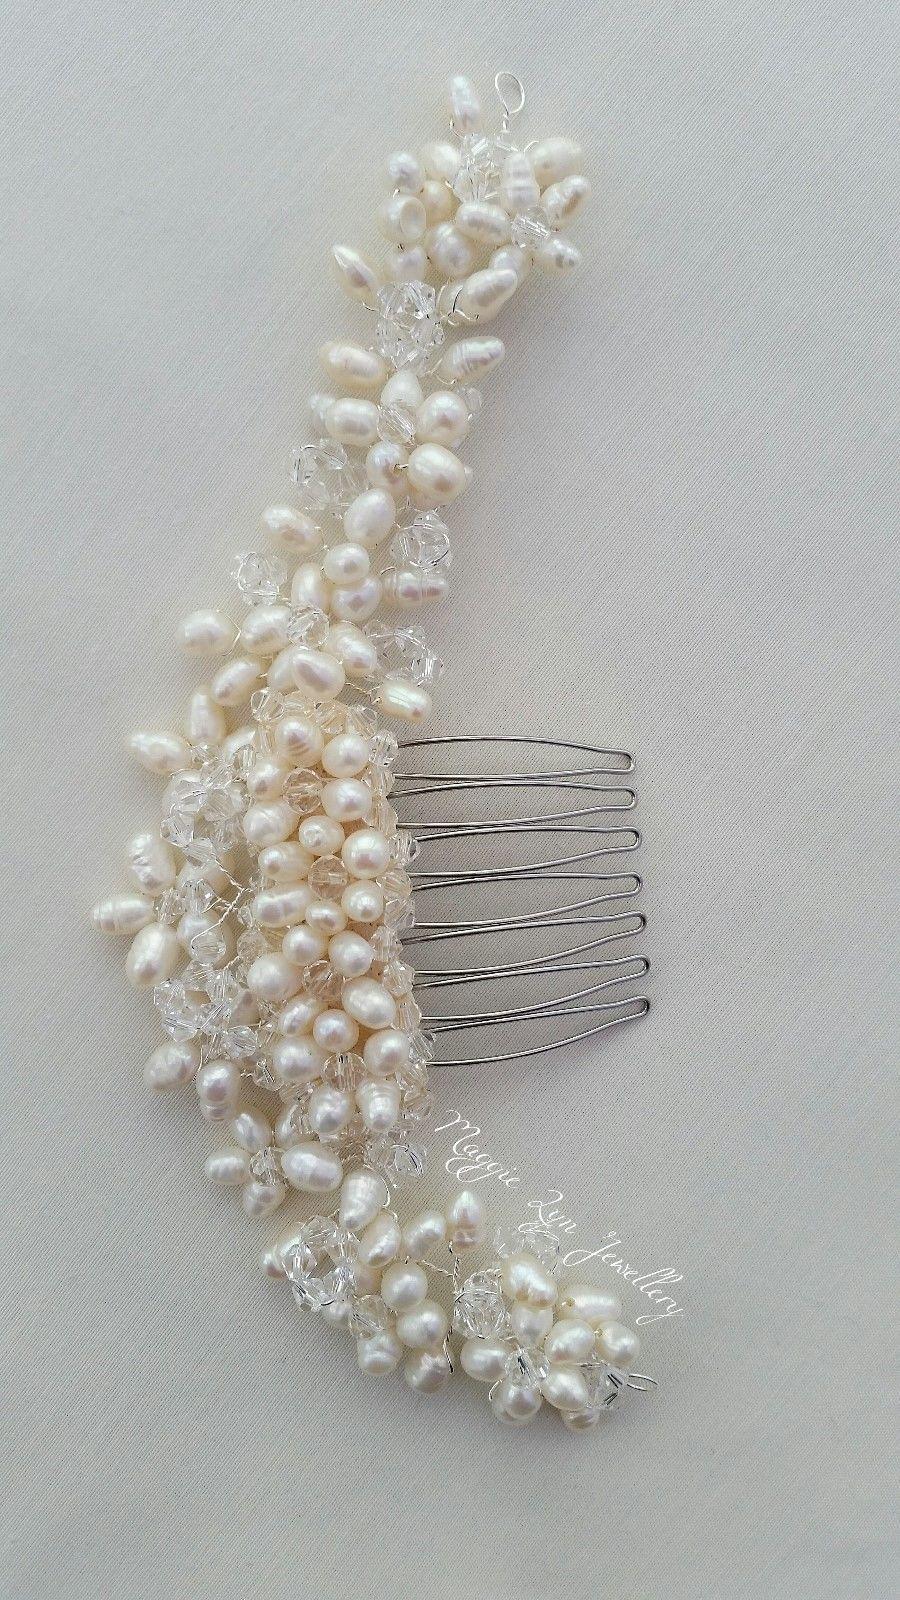 bridal hair comb slide, bun wrap, vine, freshwater pearls